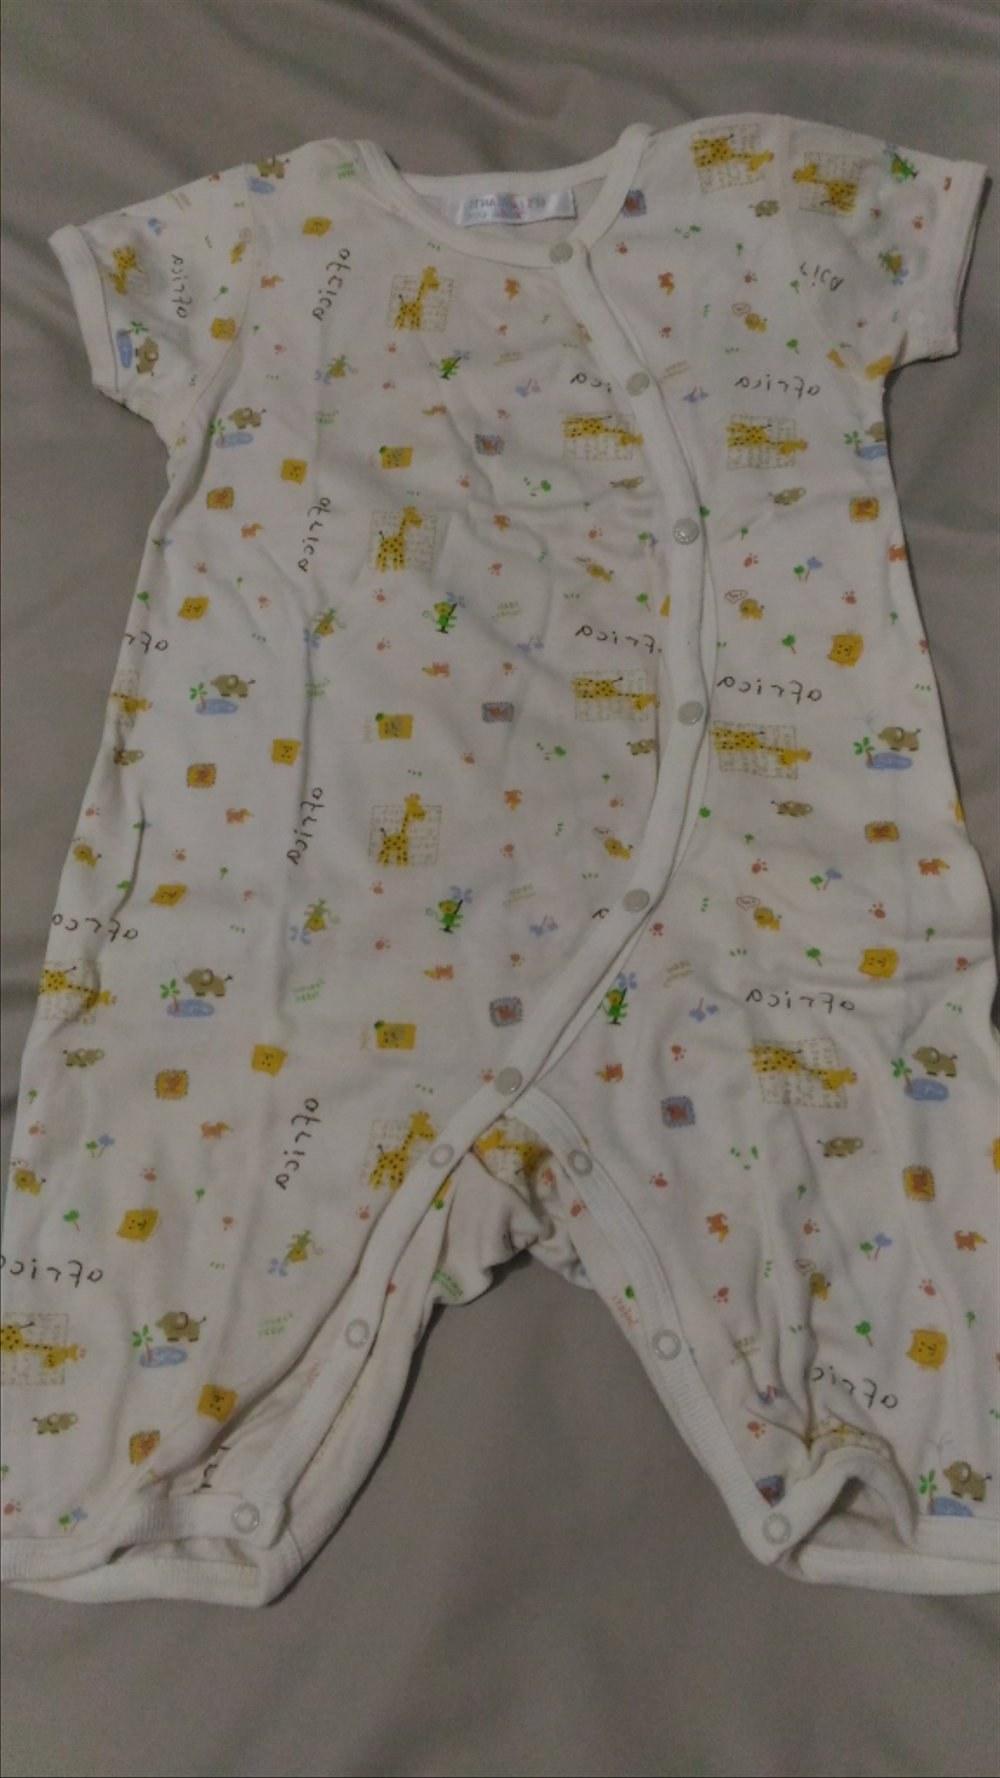 Bentuk Baju Lebaran Bayi 6 Bulan 87dx Jual Baju Bayi Umur 3 6 Bulan 4 Pcs Di Lapak